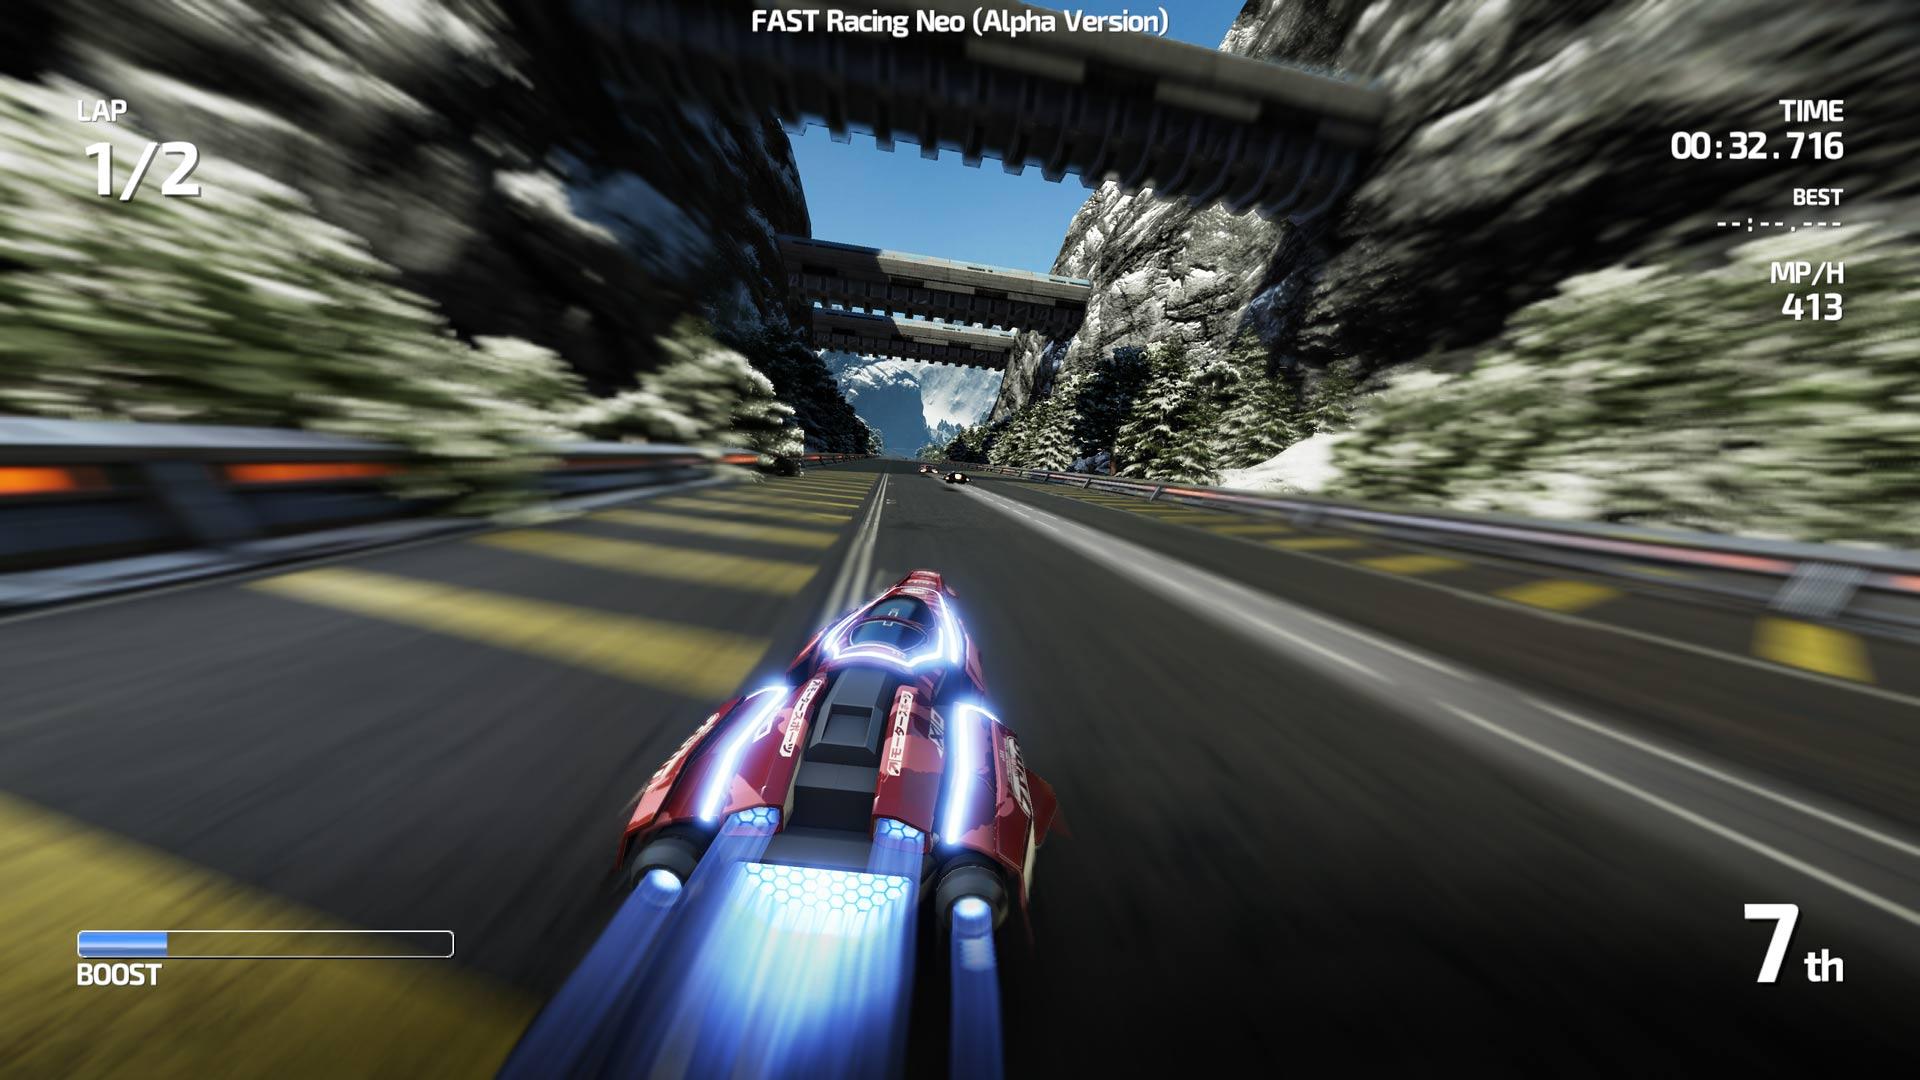 FAST Racing Neo - IndieCade 2015 gameplay (off-screen) - Nintendo ...